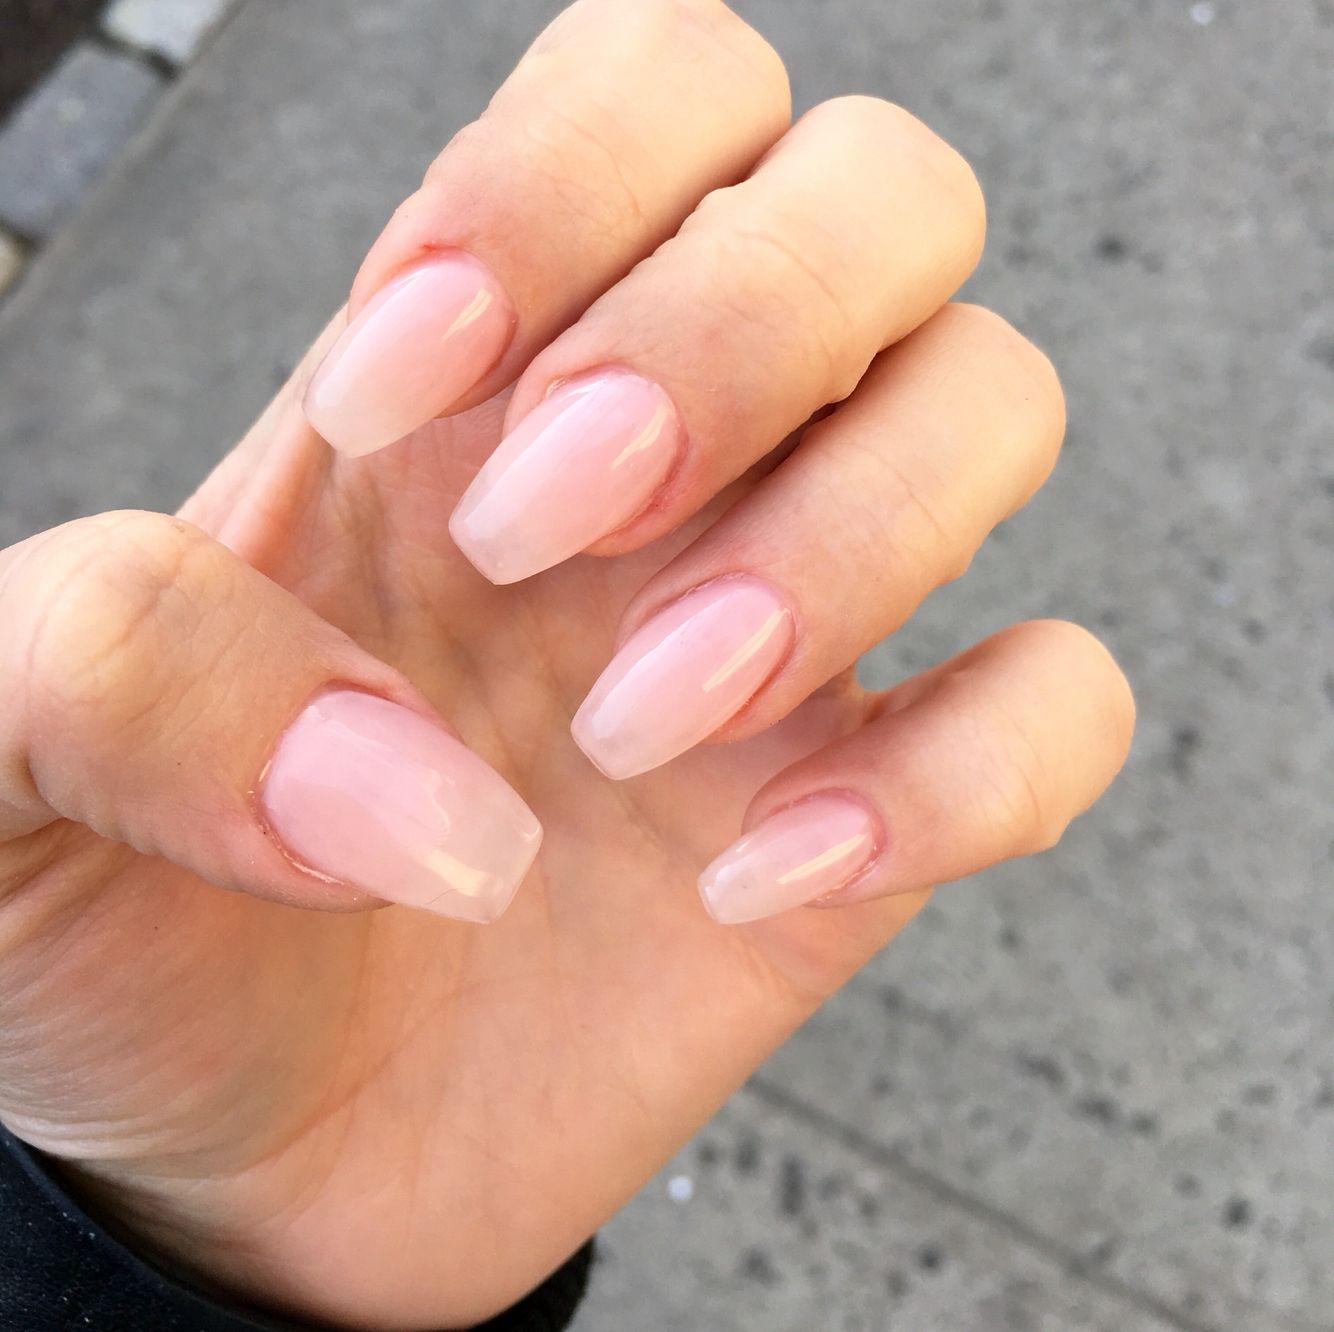 Uv Gel On Natural Nails